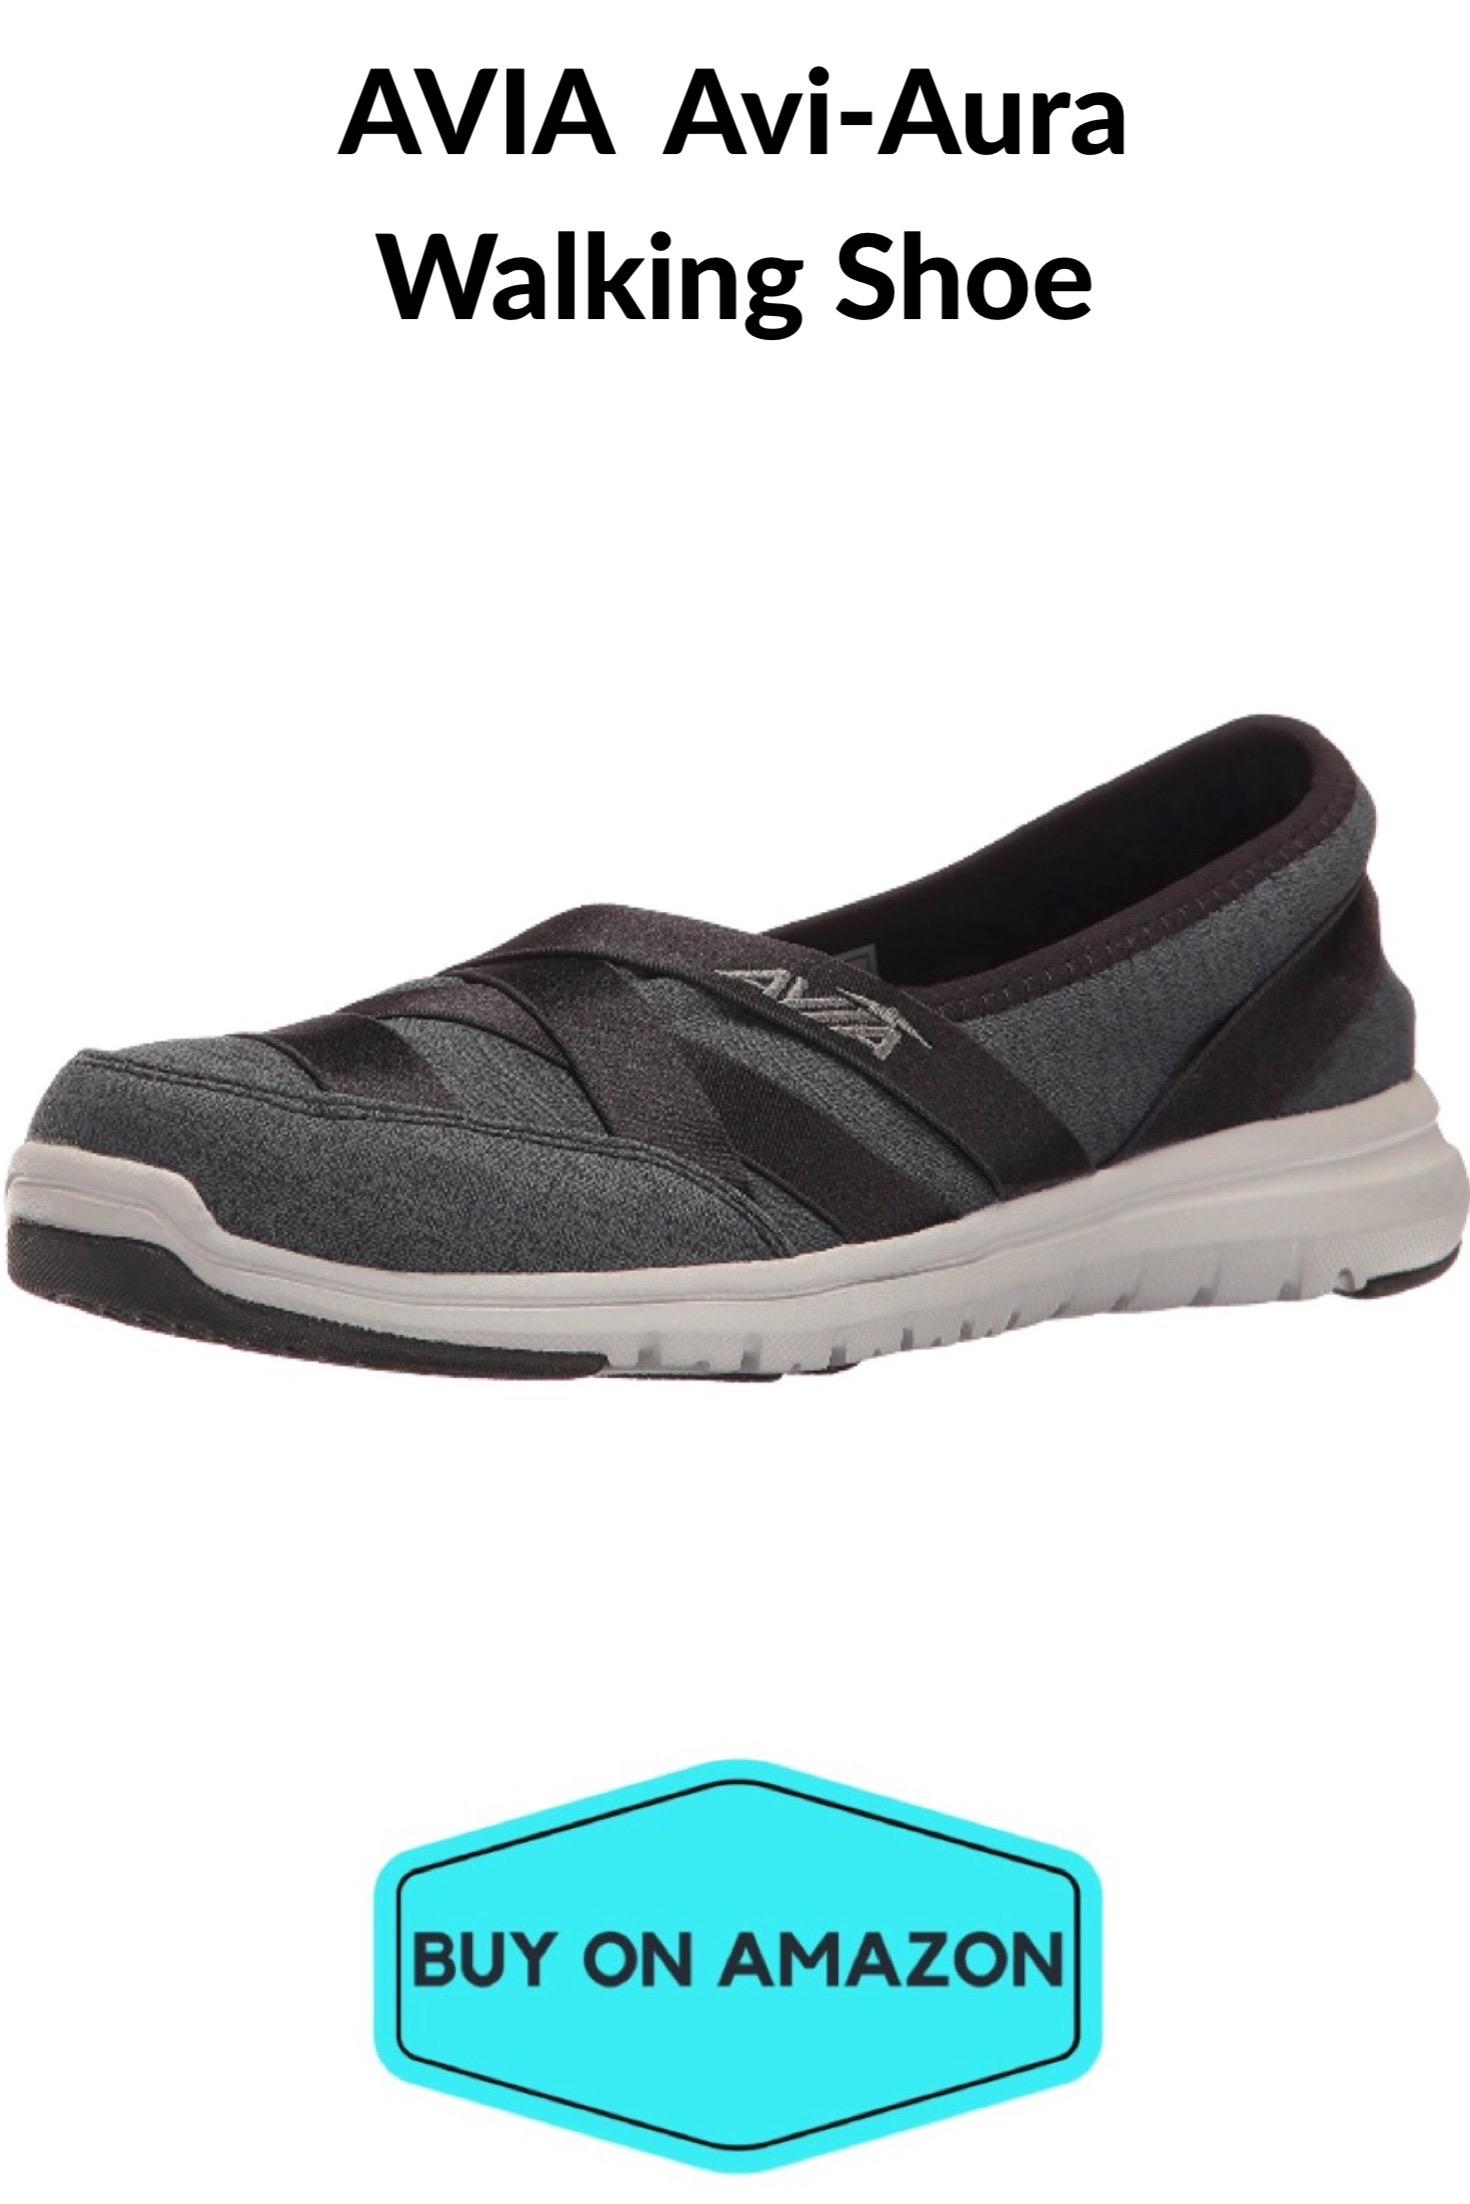 AVIA Avi-Aura Women's Walking Shoe